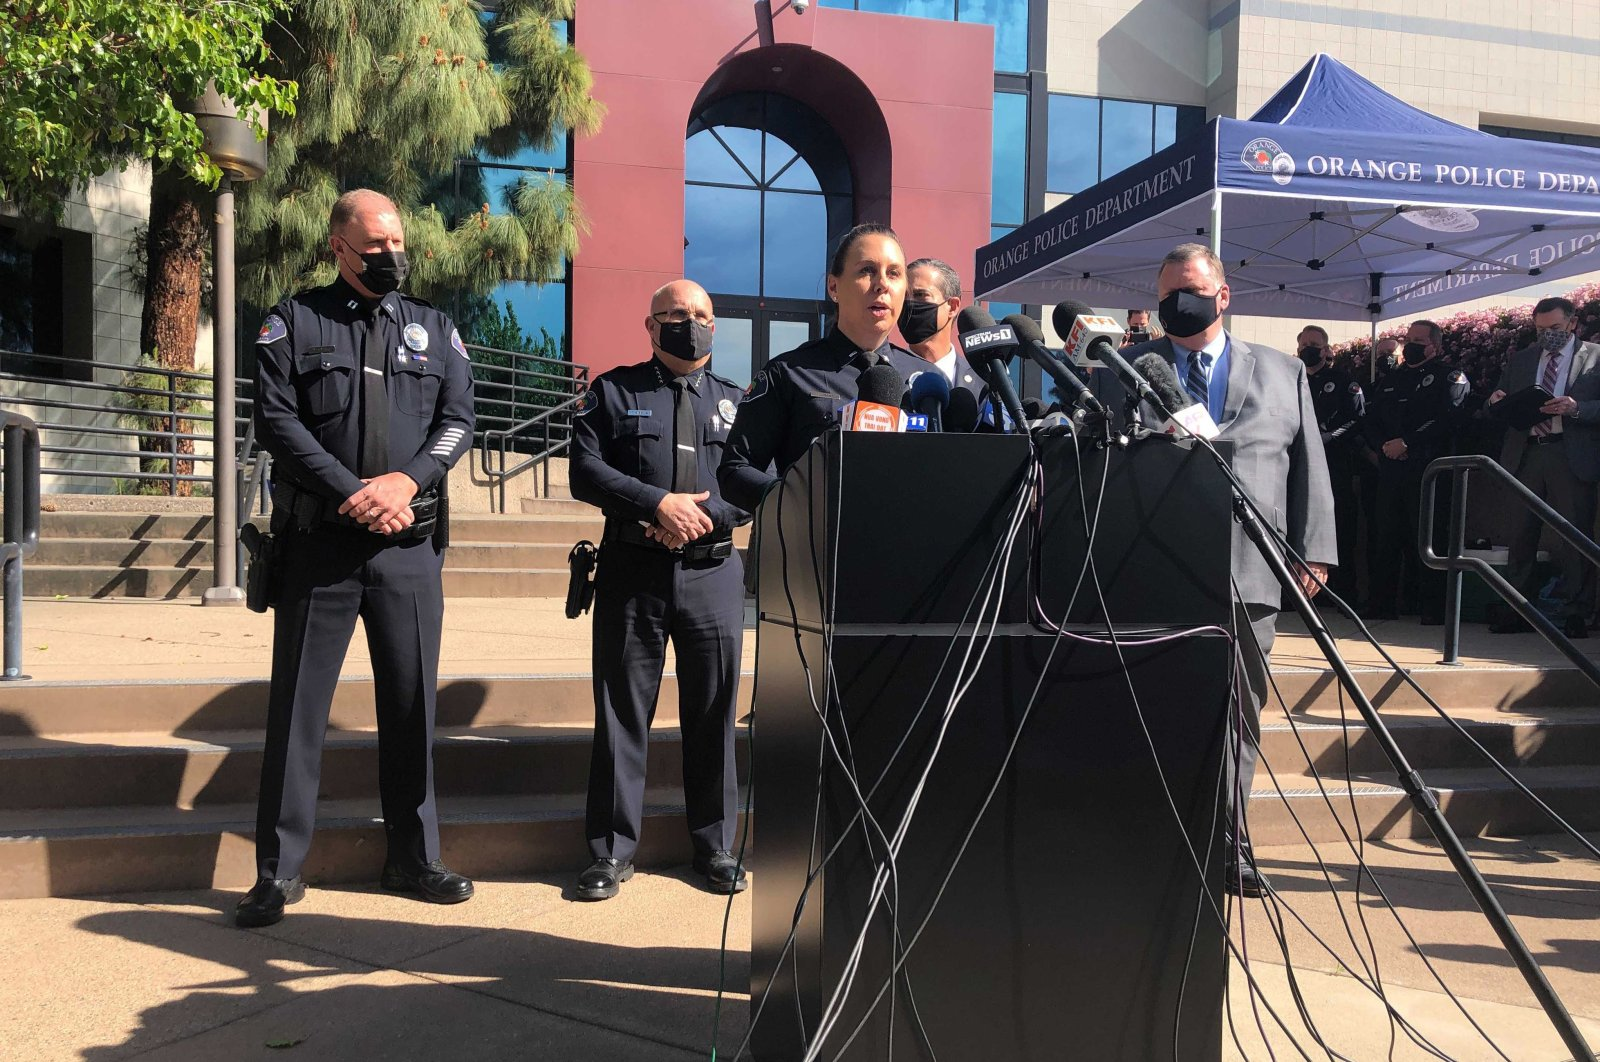 Police Lt. Jennifer Amat talks during a news conference at the Orange Police Department headquarters in Orange, Calif., April 1, 2021. (AP Photo)